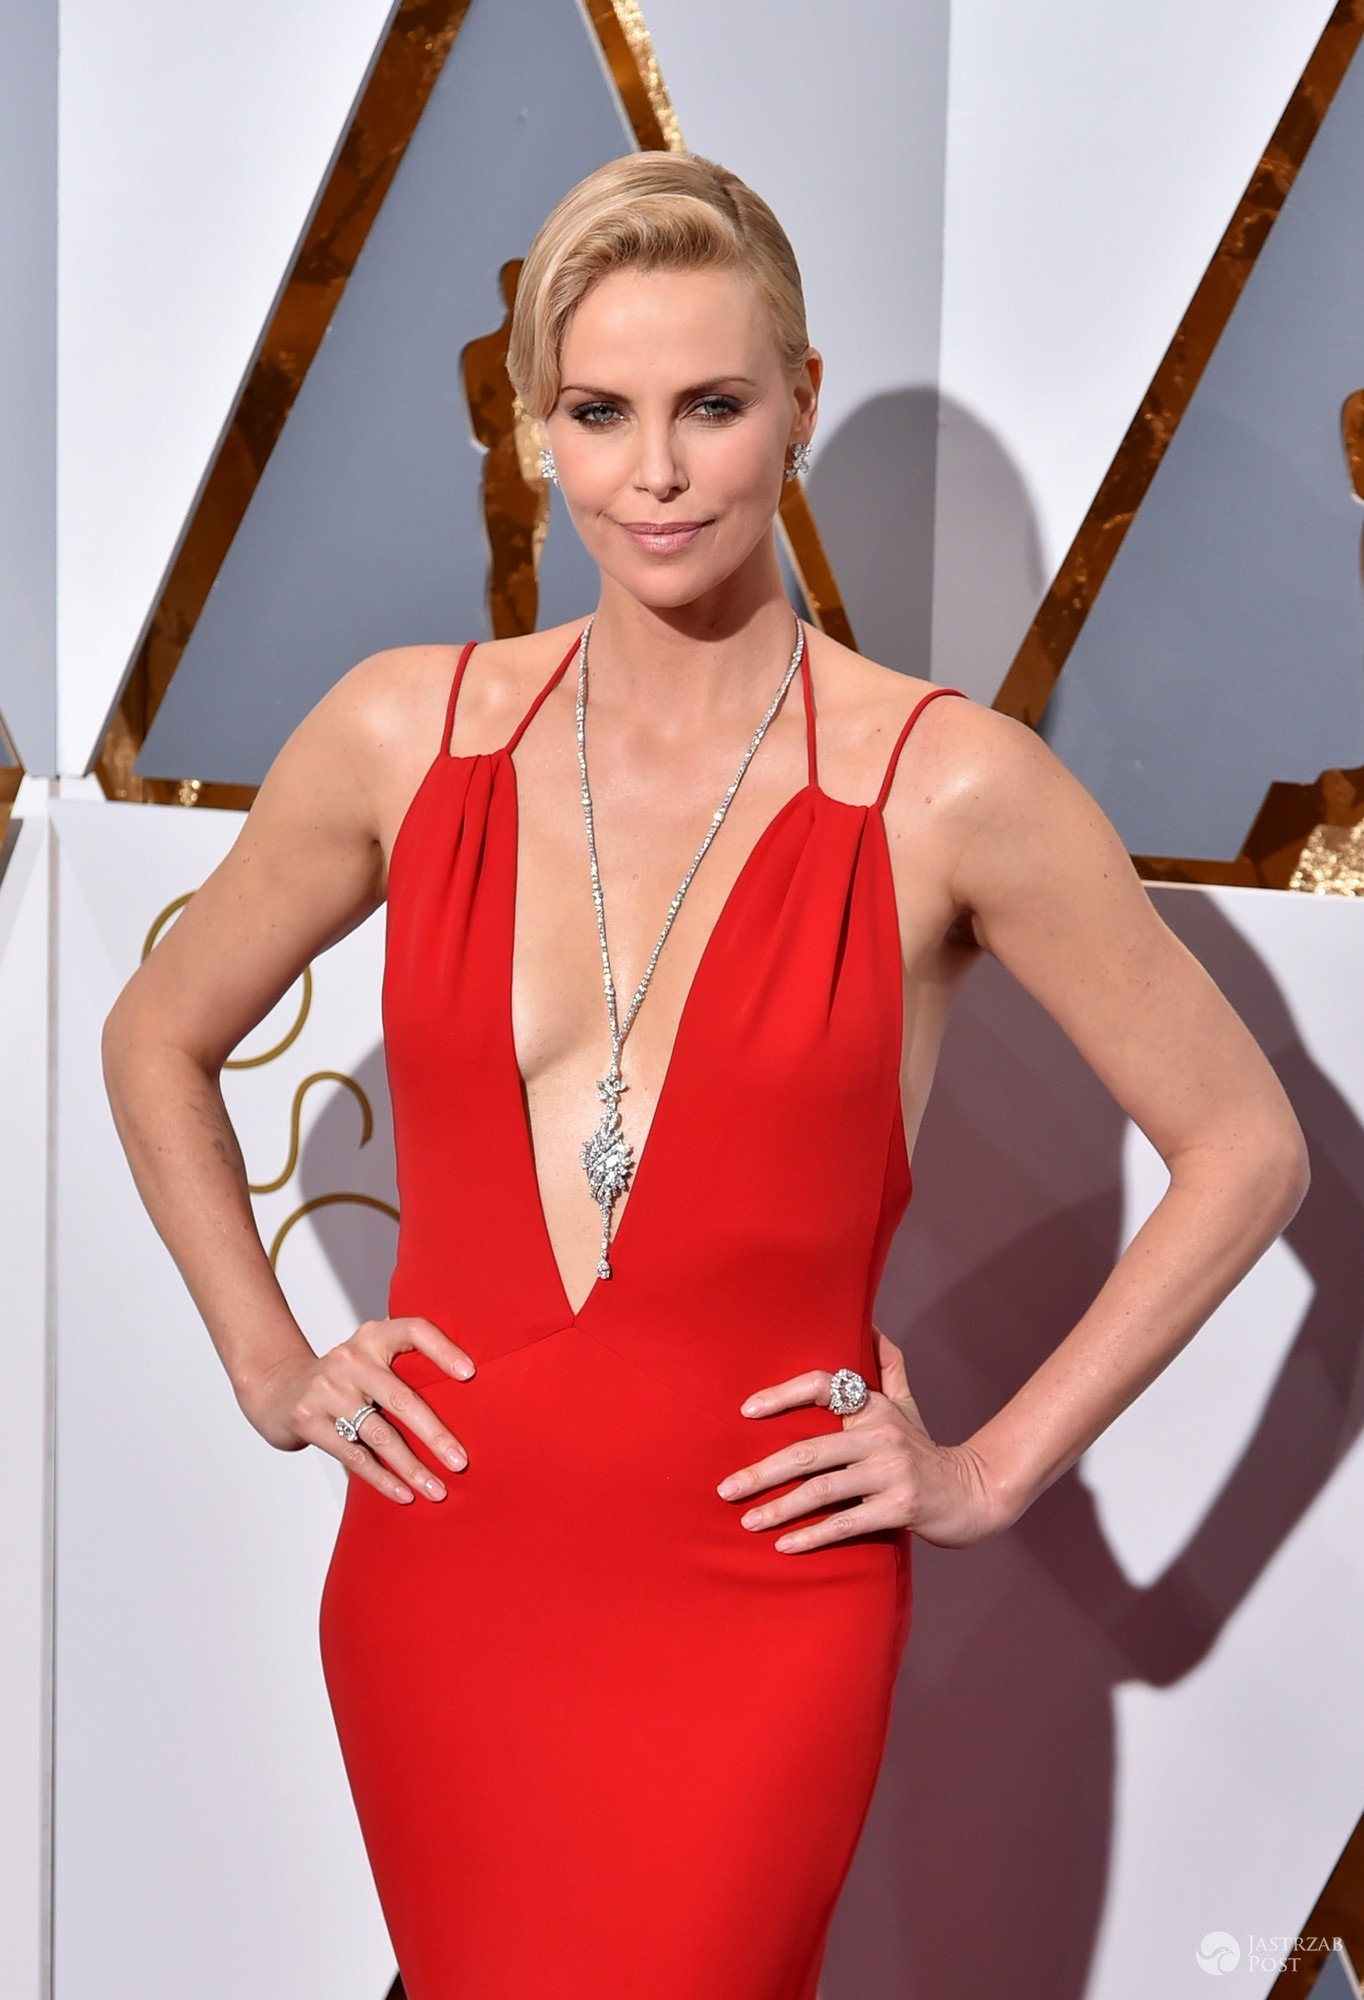 Stylizacja Charlize Theron na Oscarach 2016 (fot East News) suknia: Christian Dior